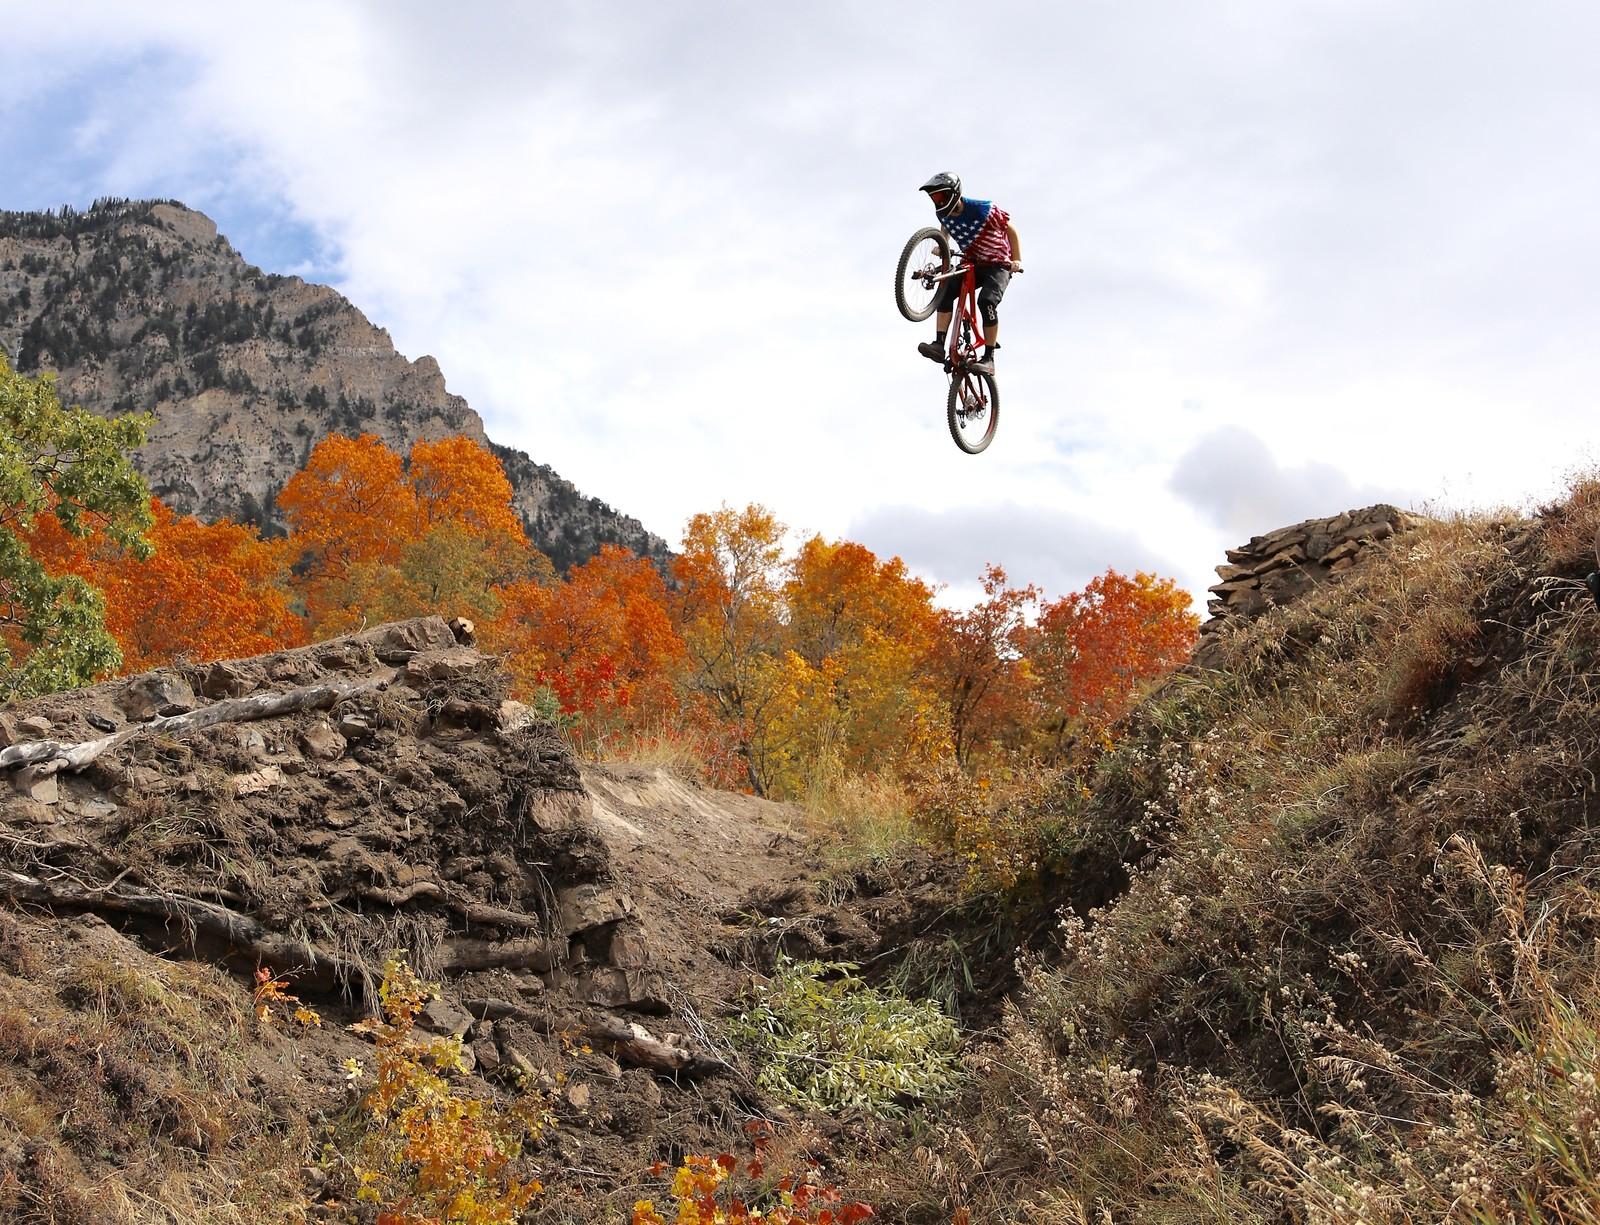 New sender in Utah County  - dirtworks911 - Mountain Biking Pictures - Vital MTB